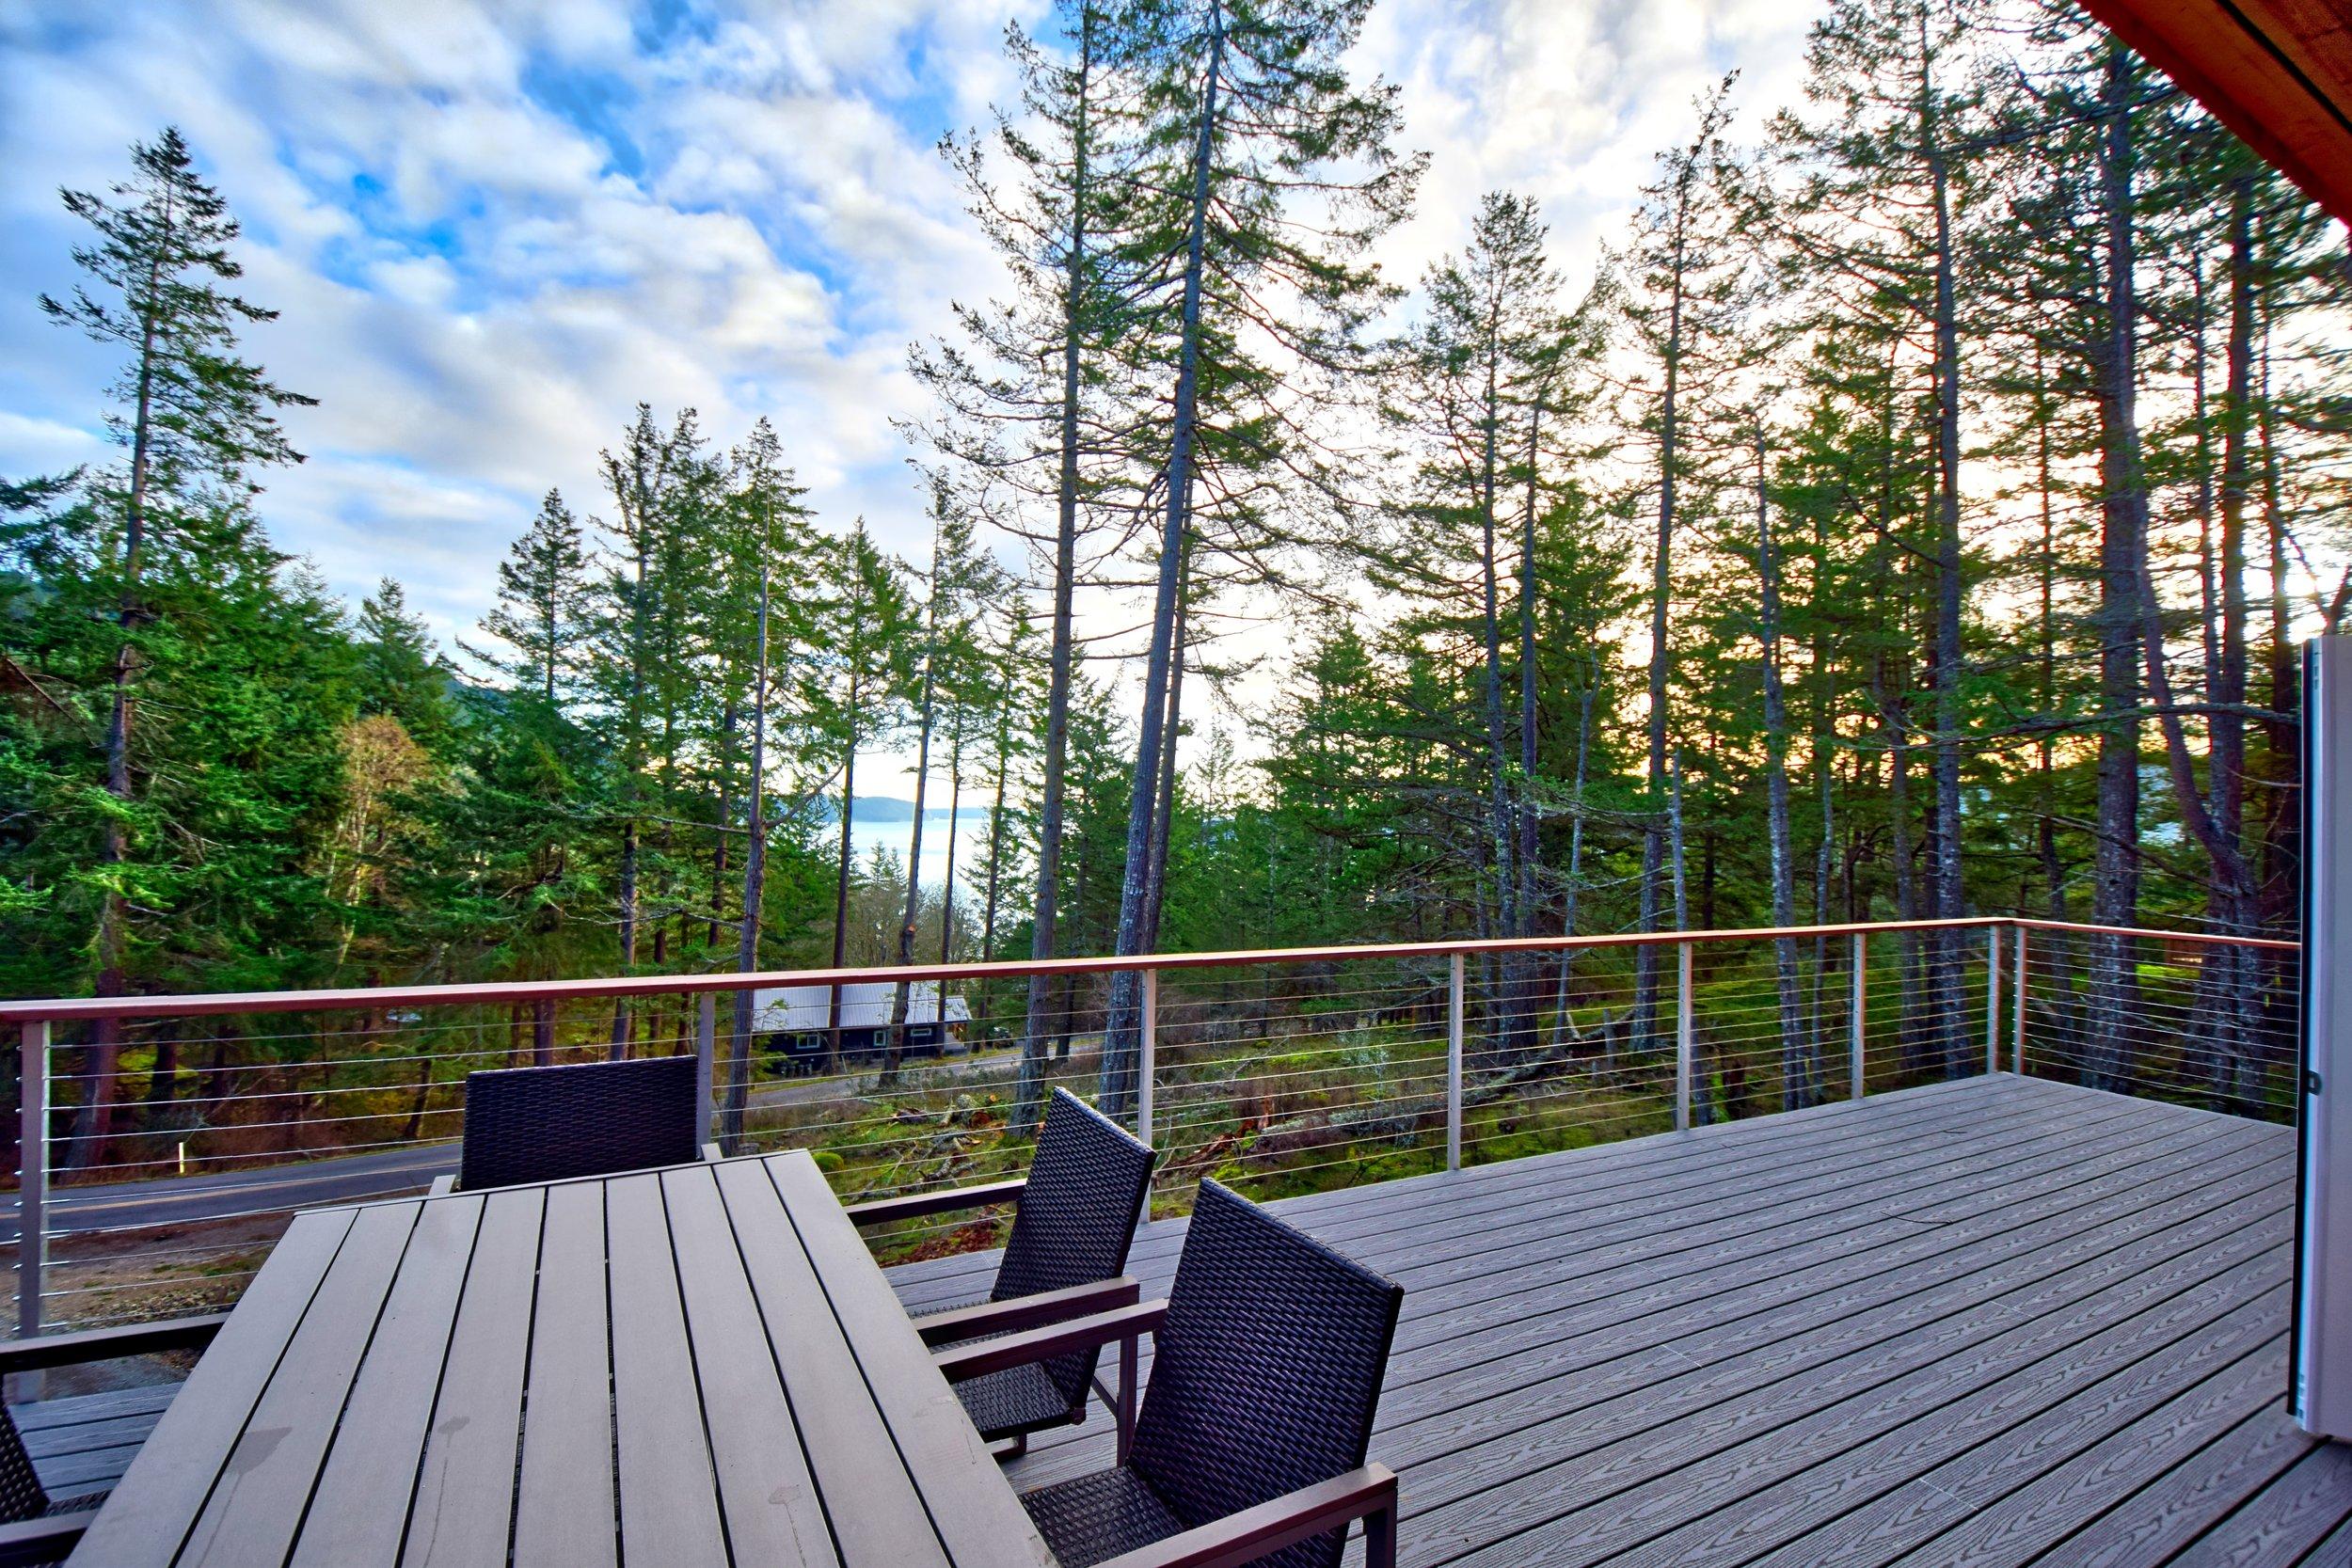 Deck_Views.jpeg